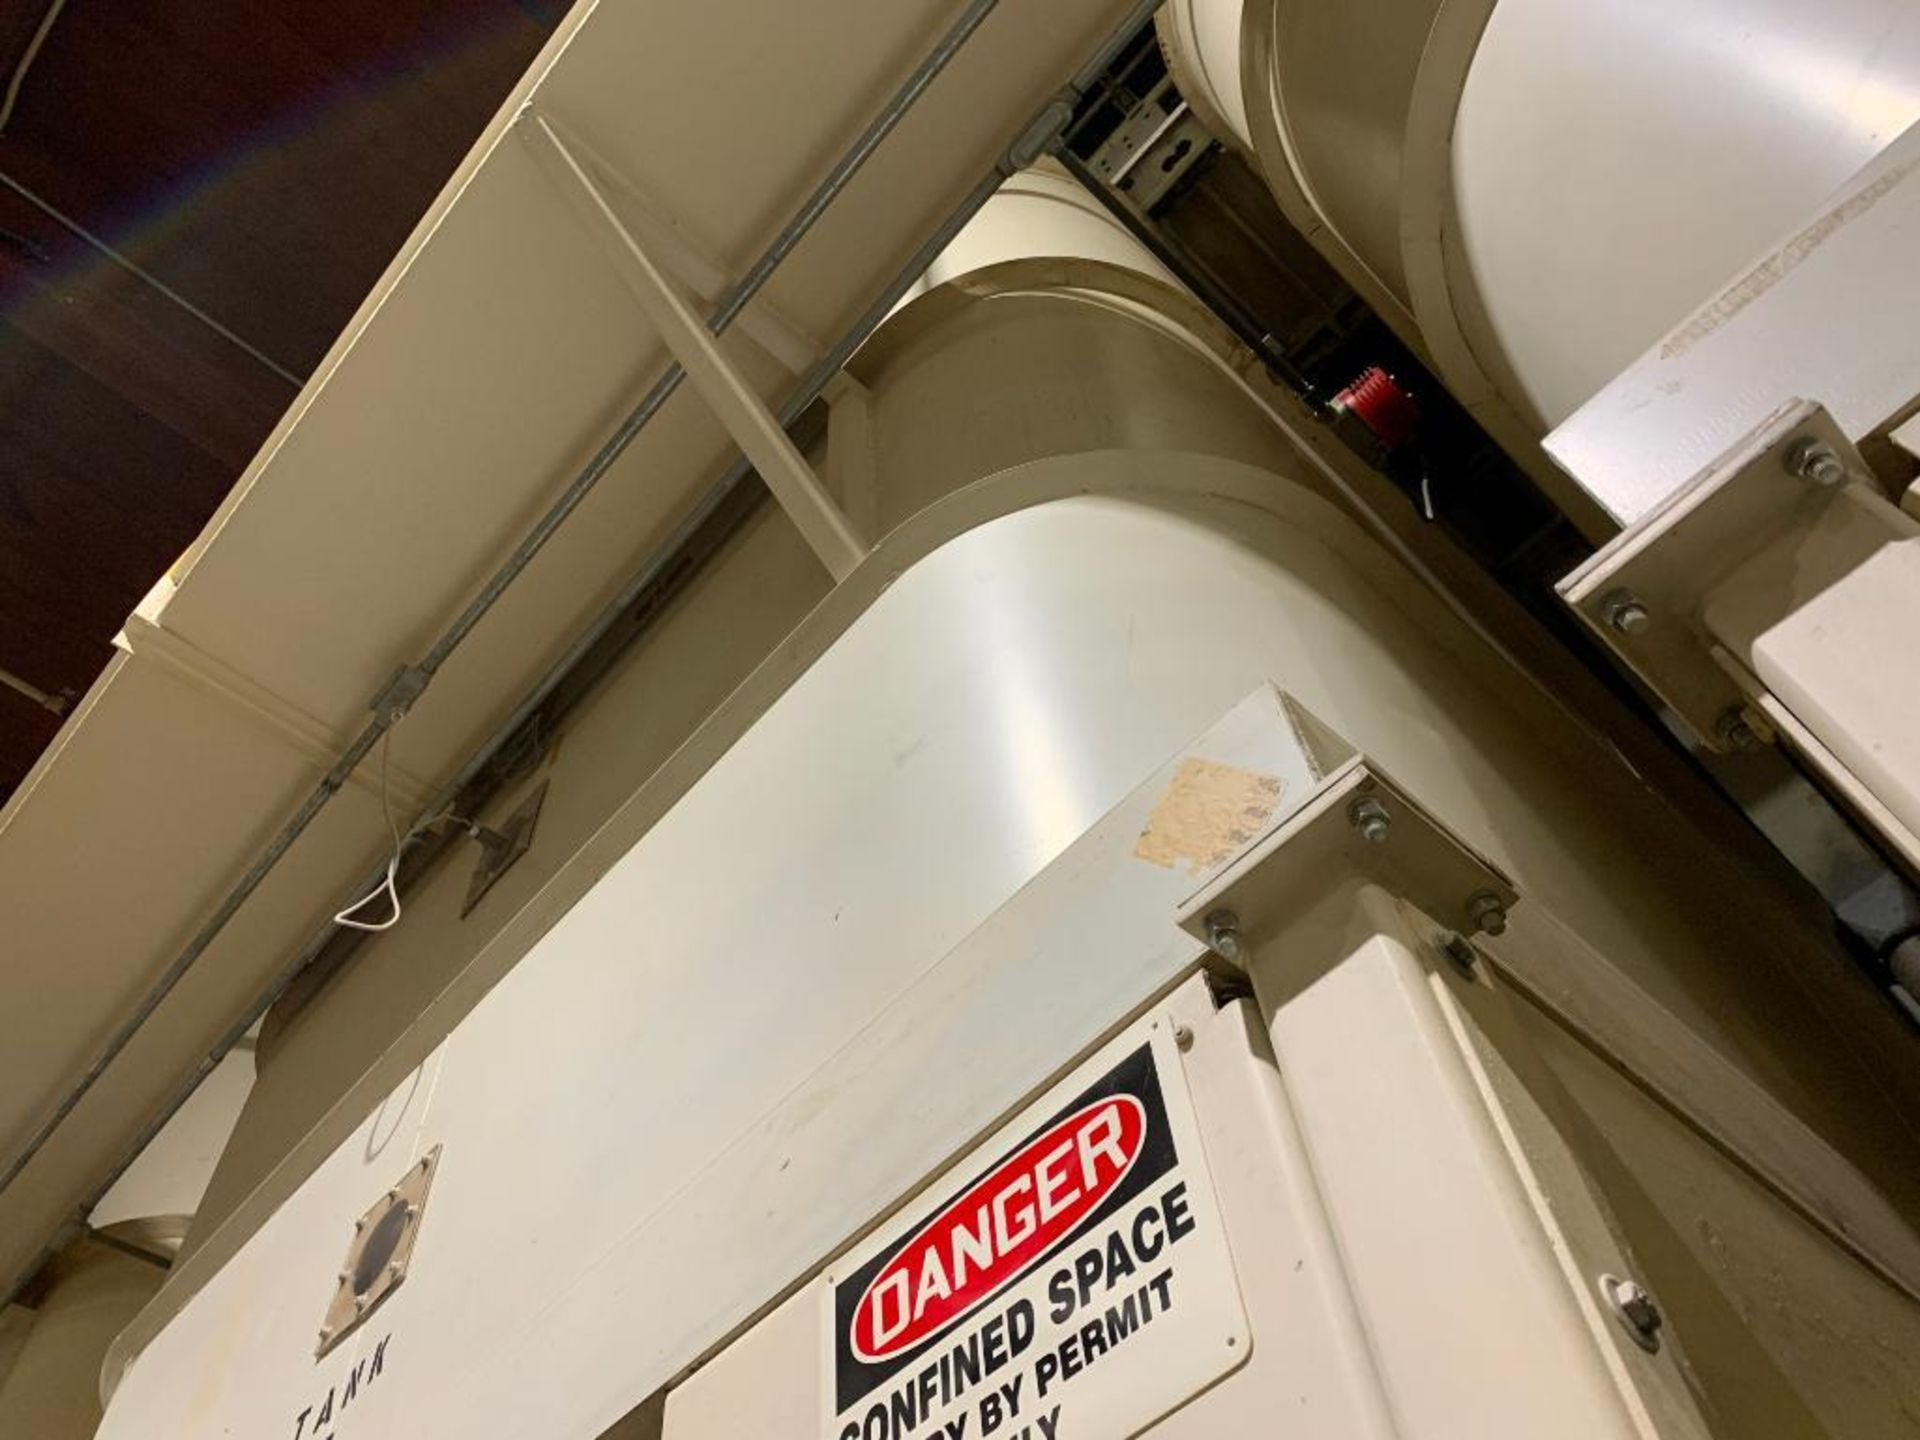 Aseeco mild steel cone bottom bulk storage bin - Image 16 of 19